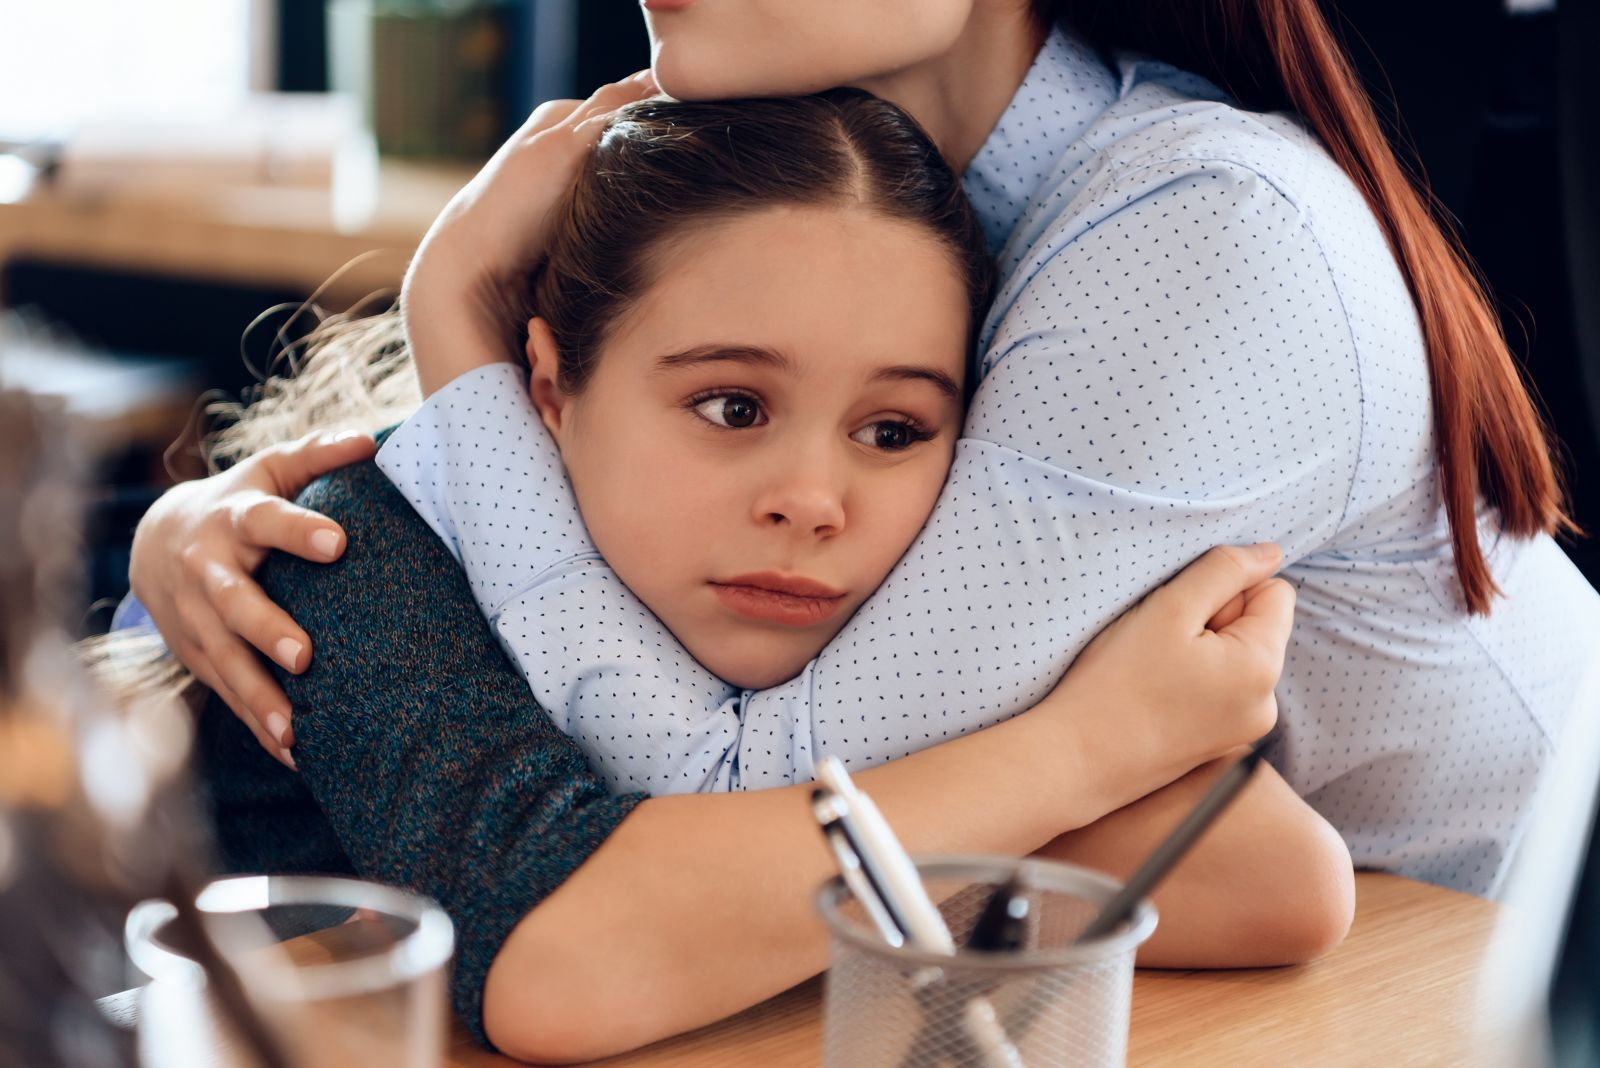 Woman Hugging Sad Scared Child banner image